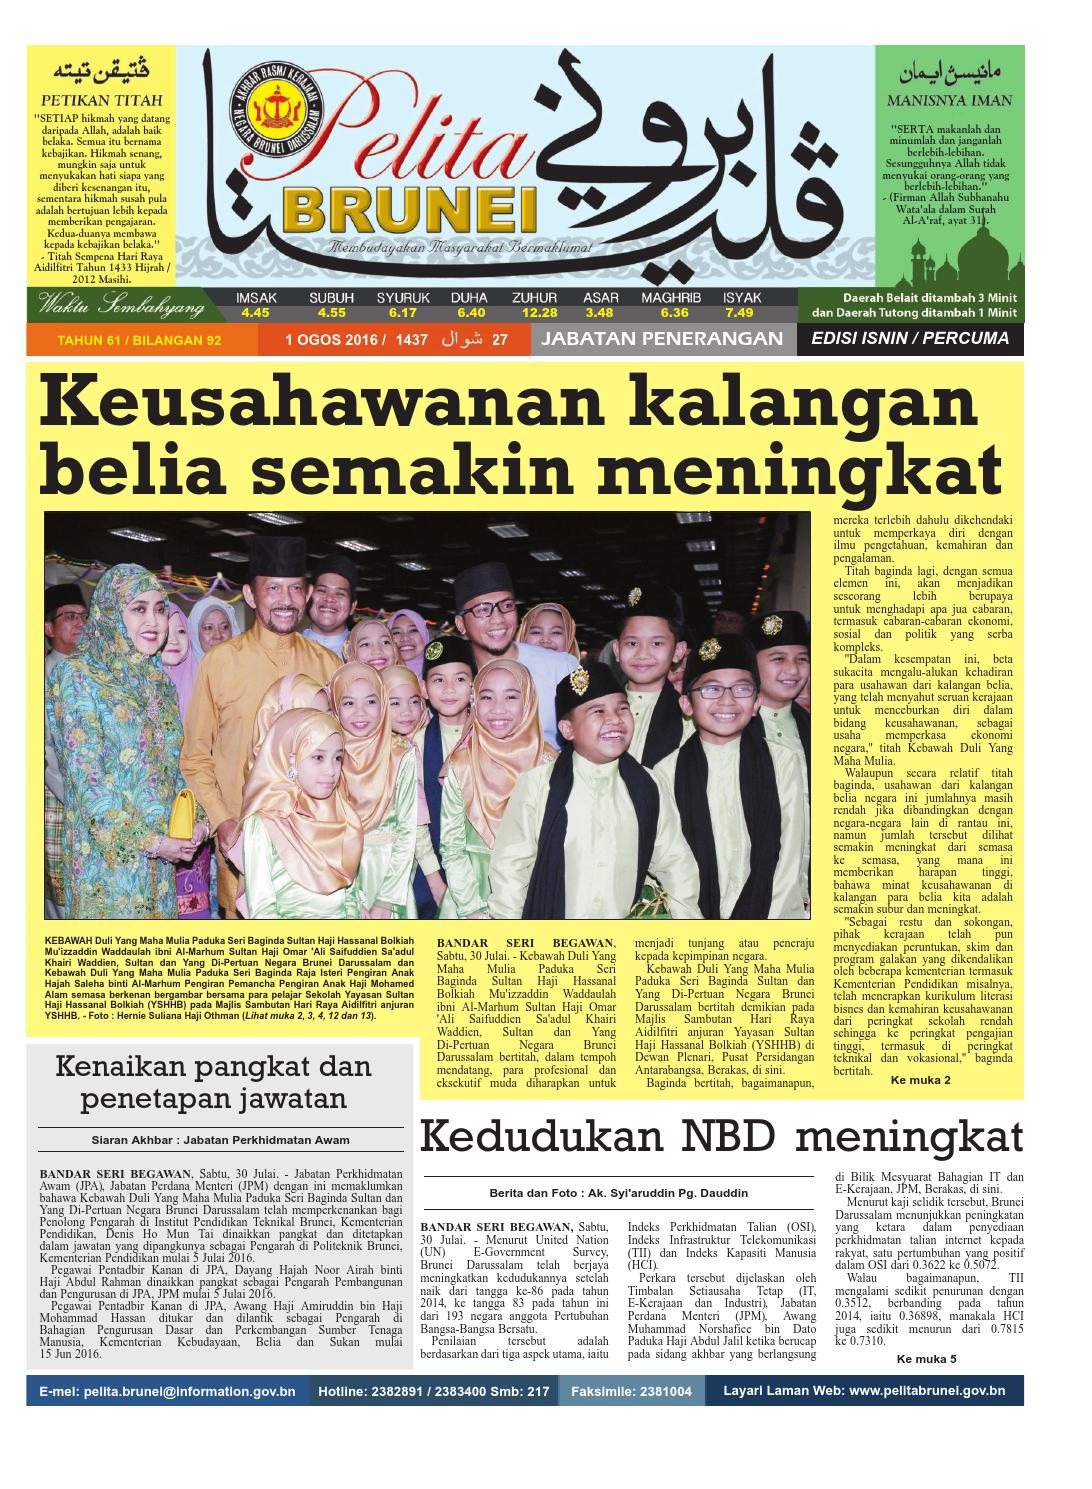 Pelita Brunei Isnin 1 Ogos 2016 By Putera Katak Brunei Issuu